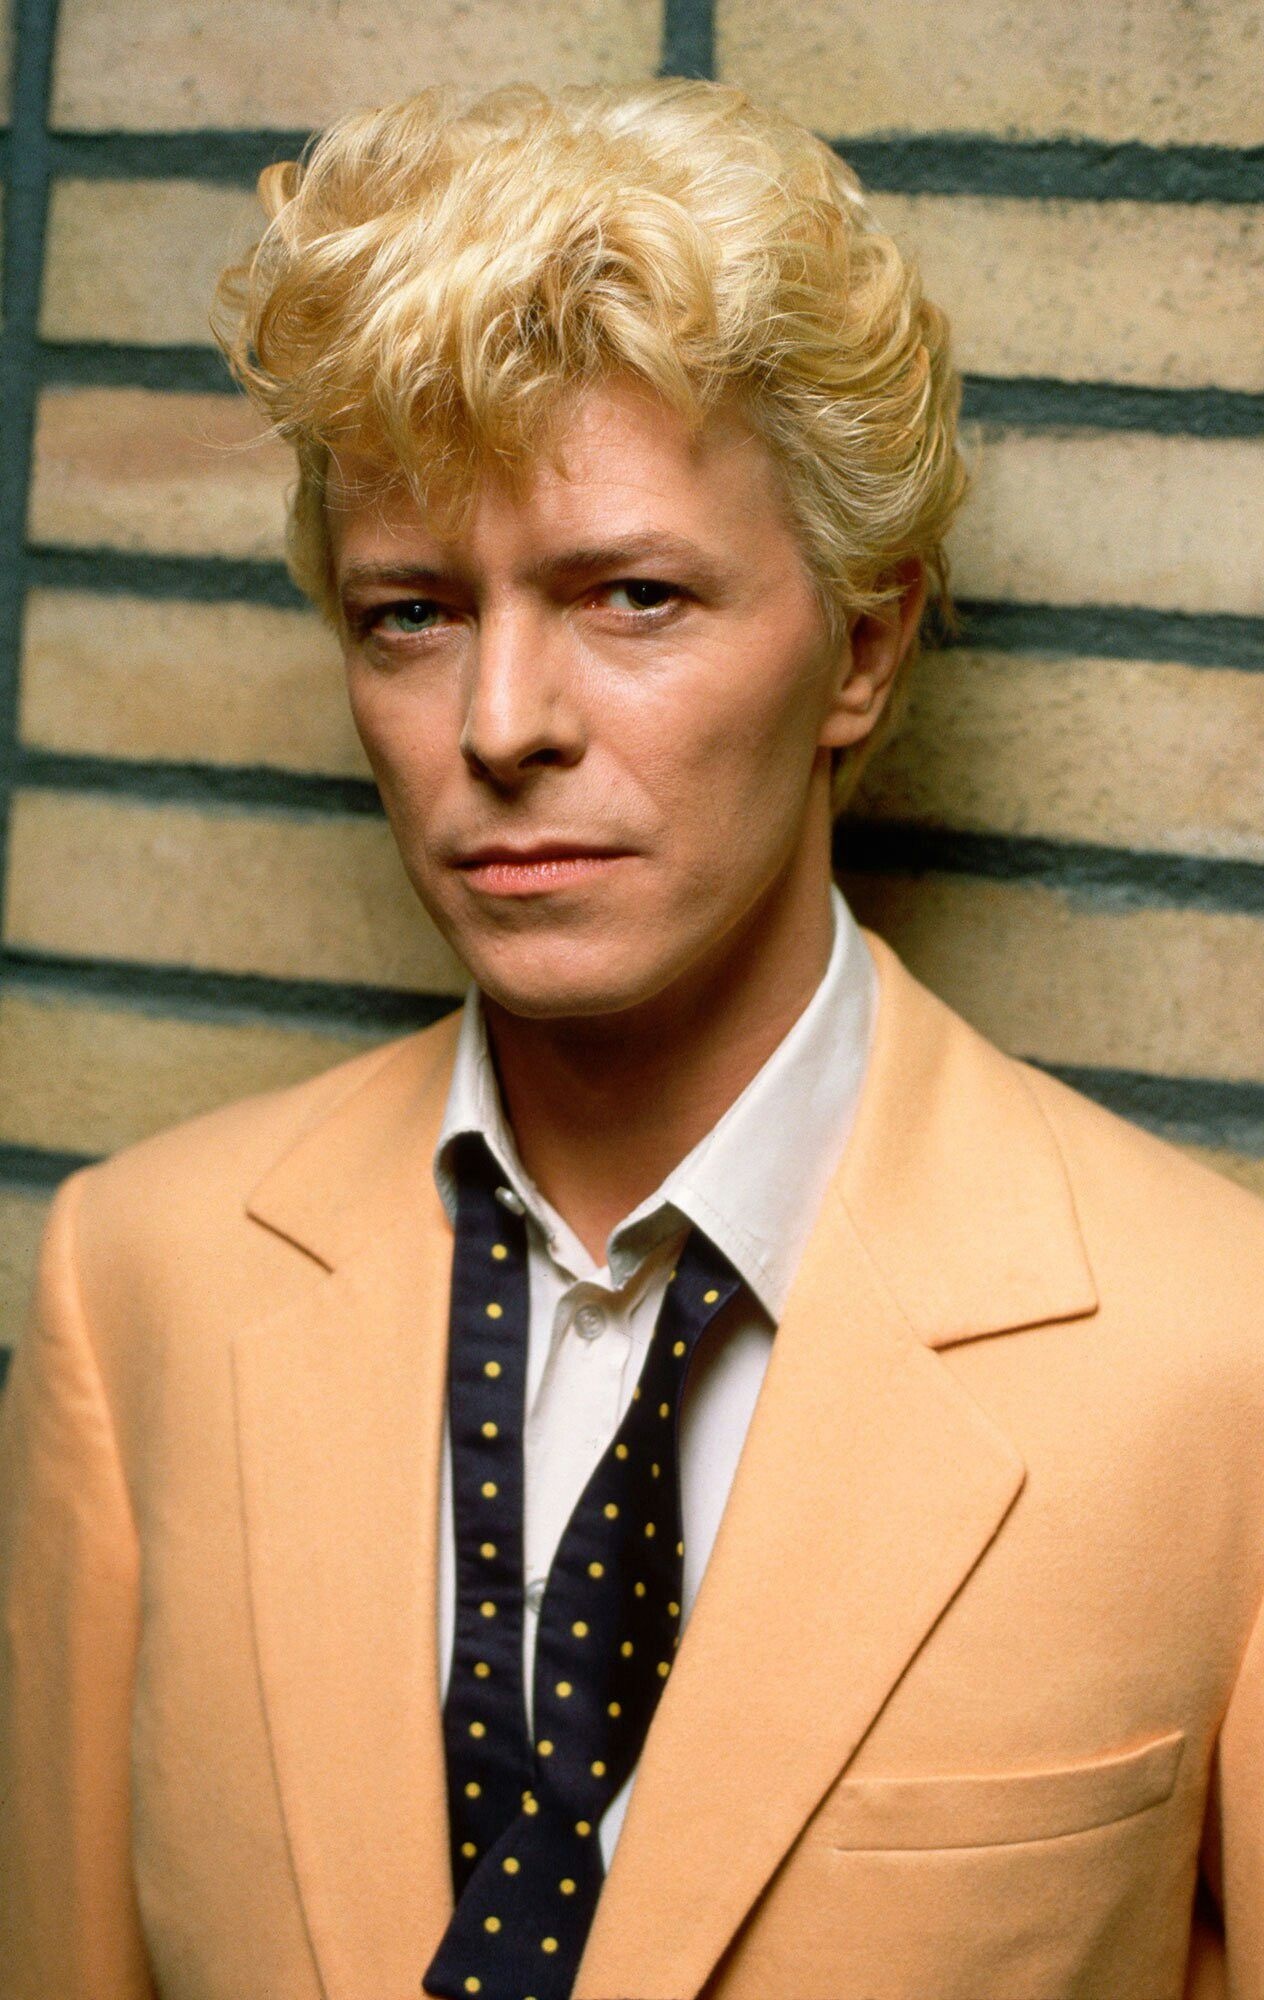 DB, 1983